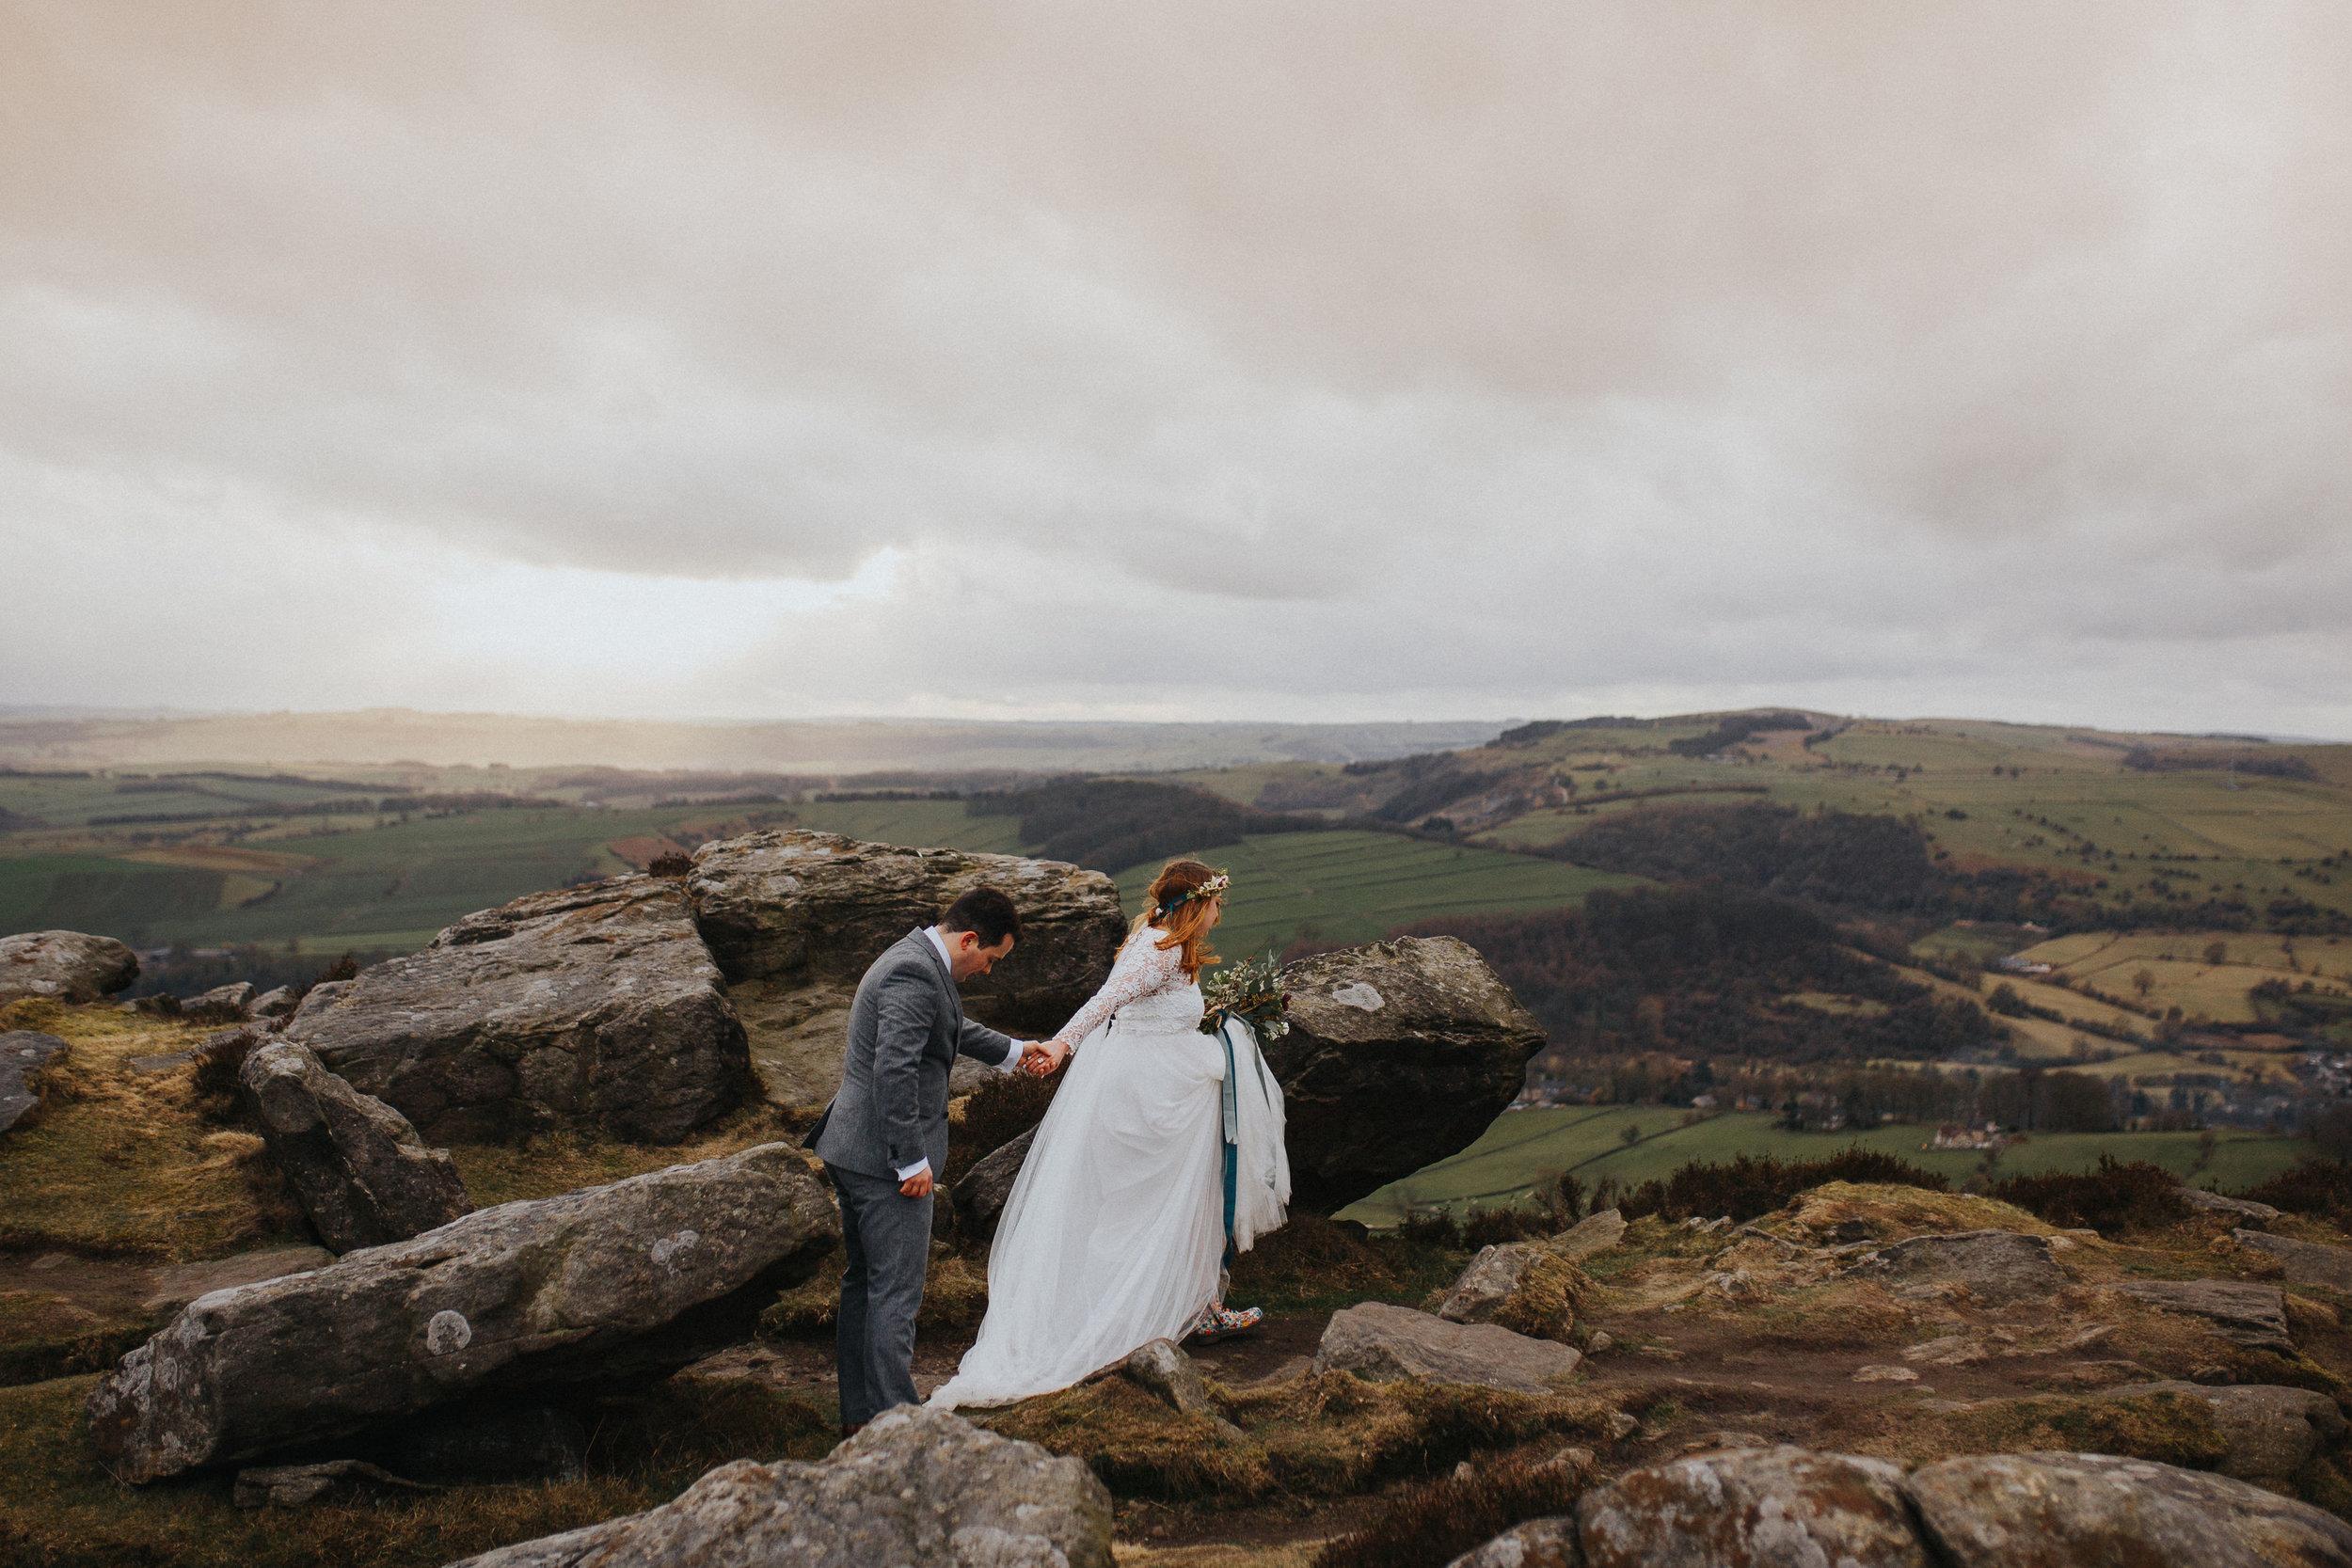 Rosie-bespoke-lace-long sleeved-tulle-wedding-dress-winter-peak district-susanna greening-18.jpg